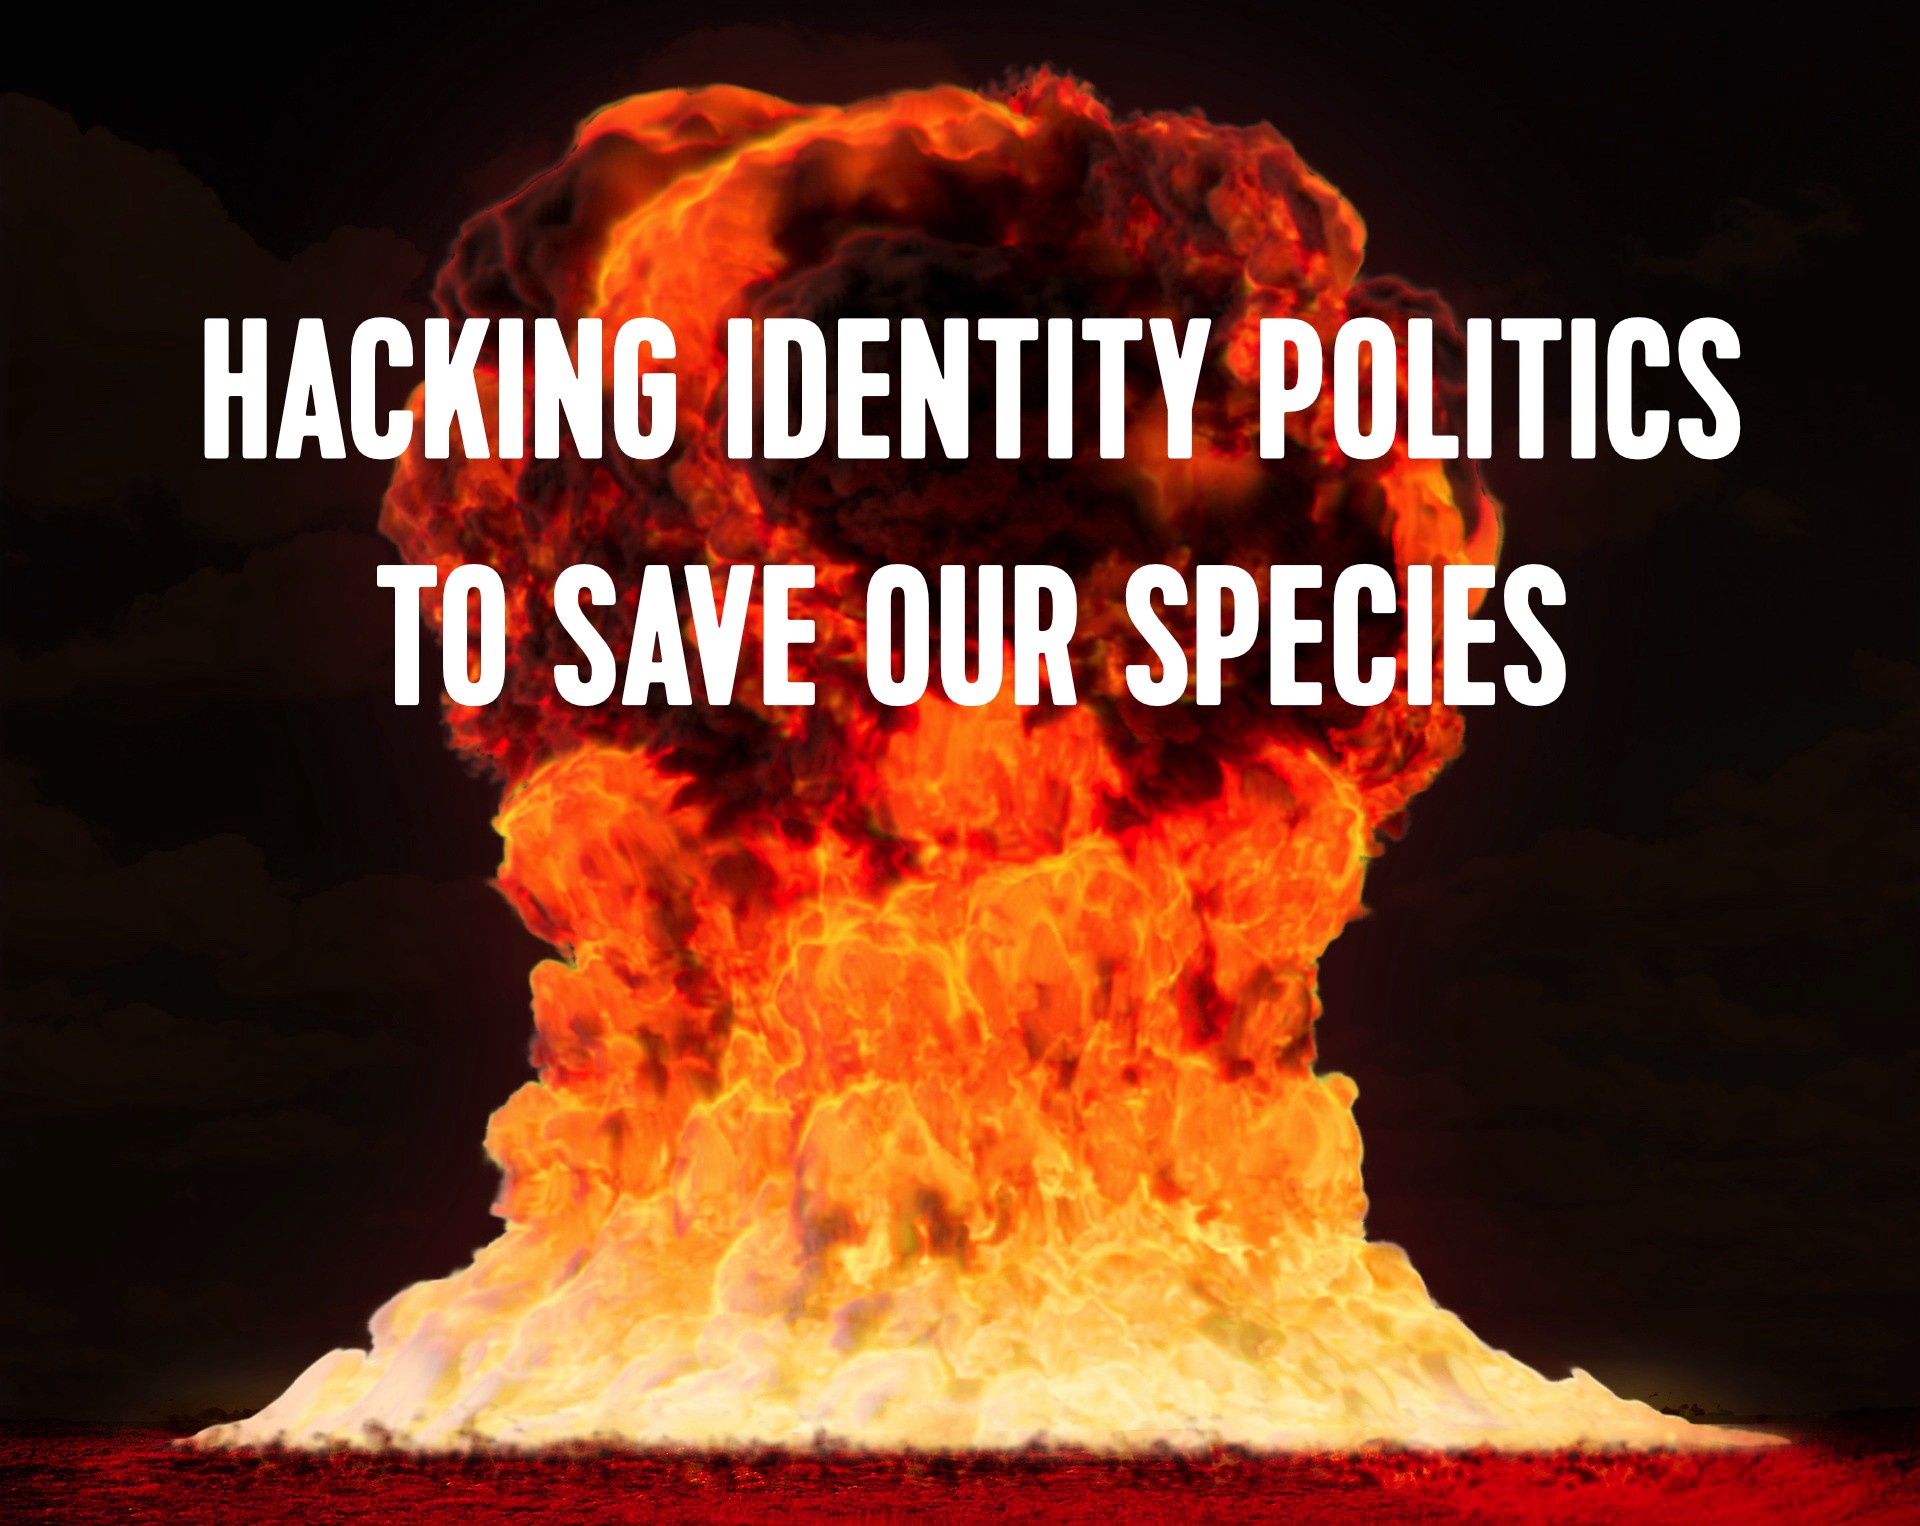 Hacking Identity (Politics) - By Nick Seneca Jankel